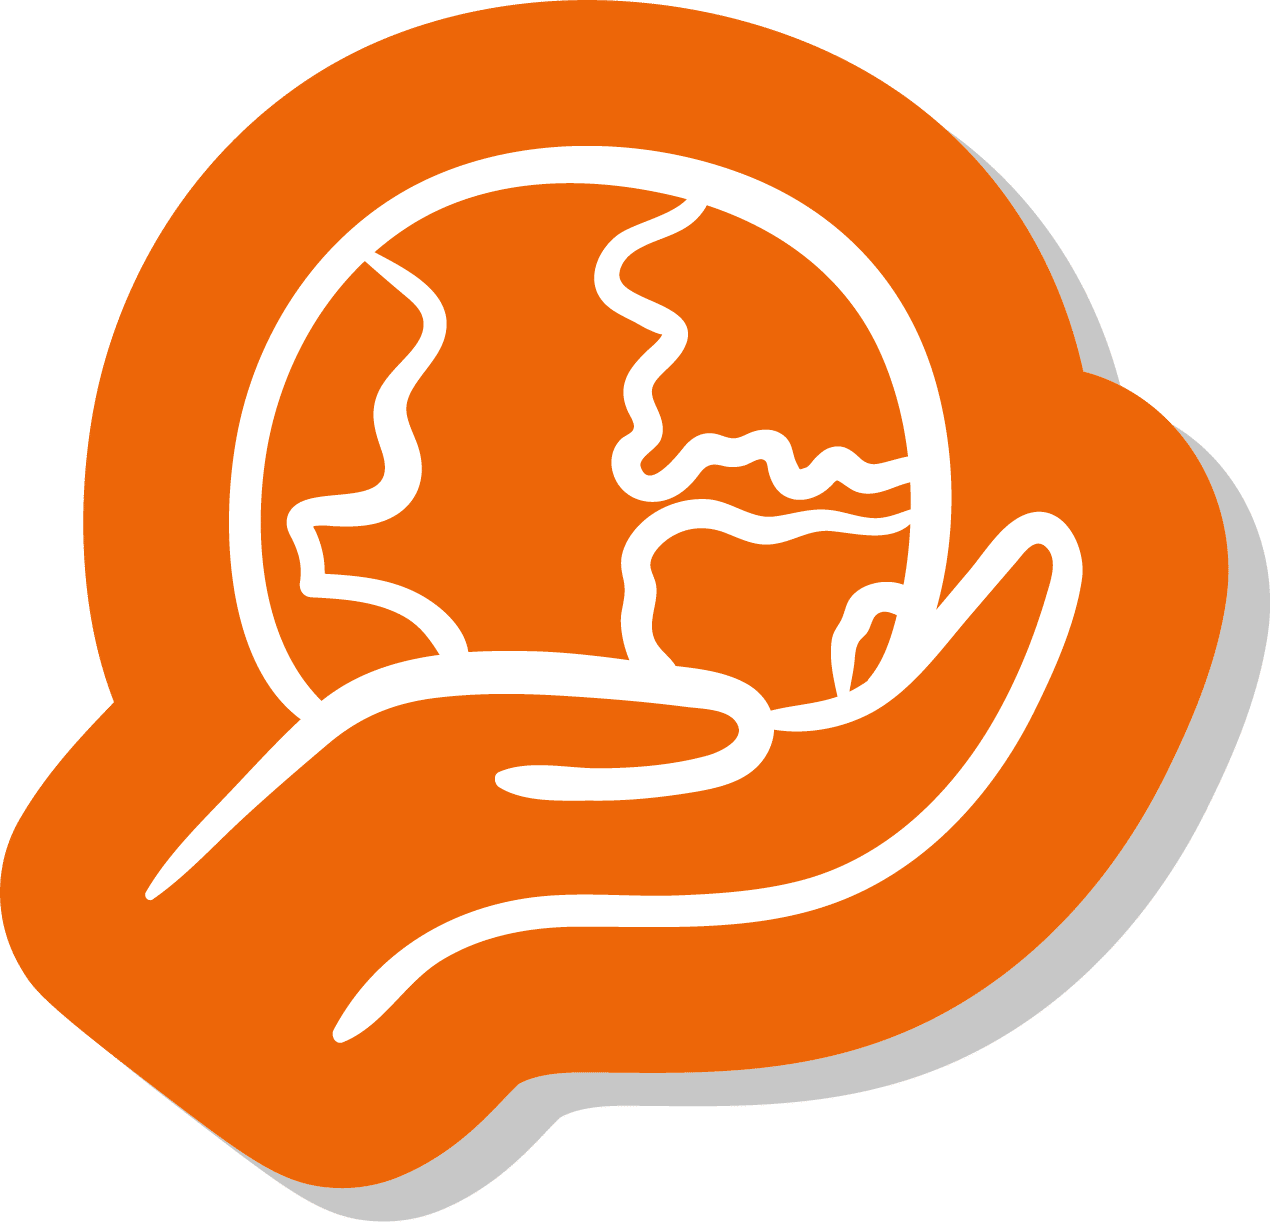 Logo Engagement Konsum